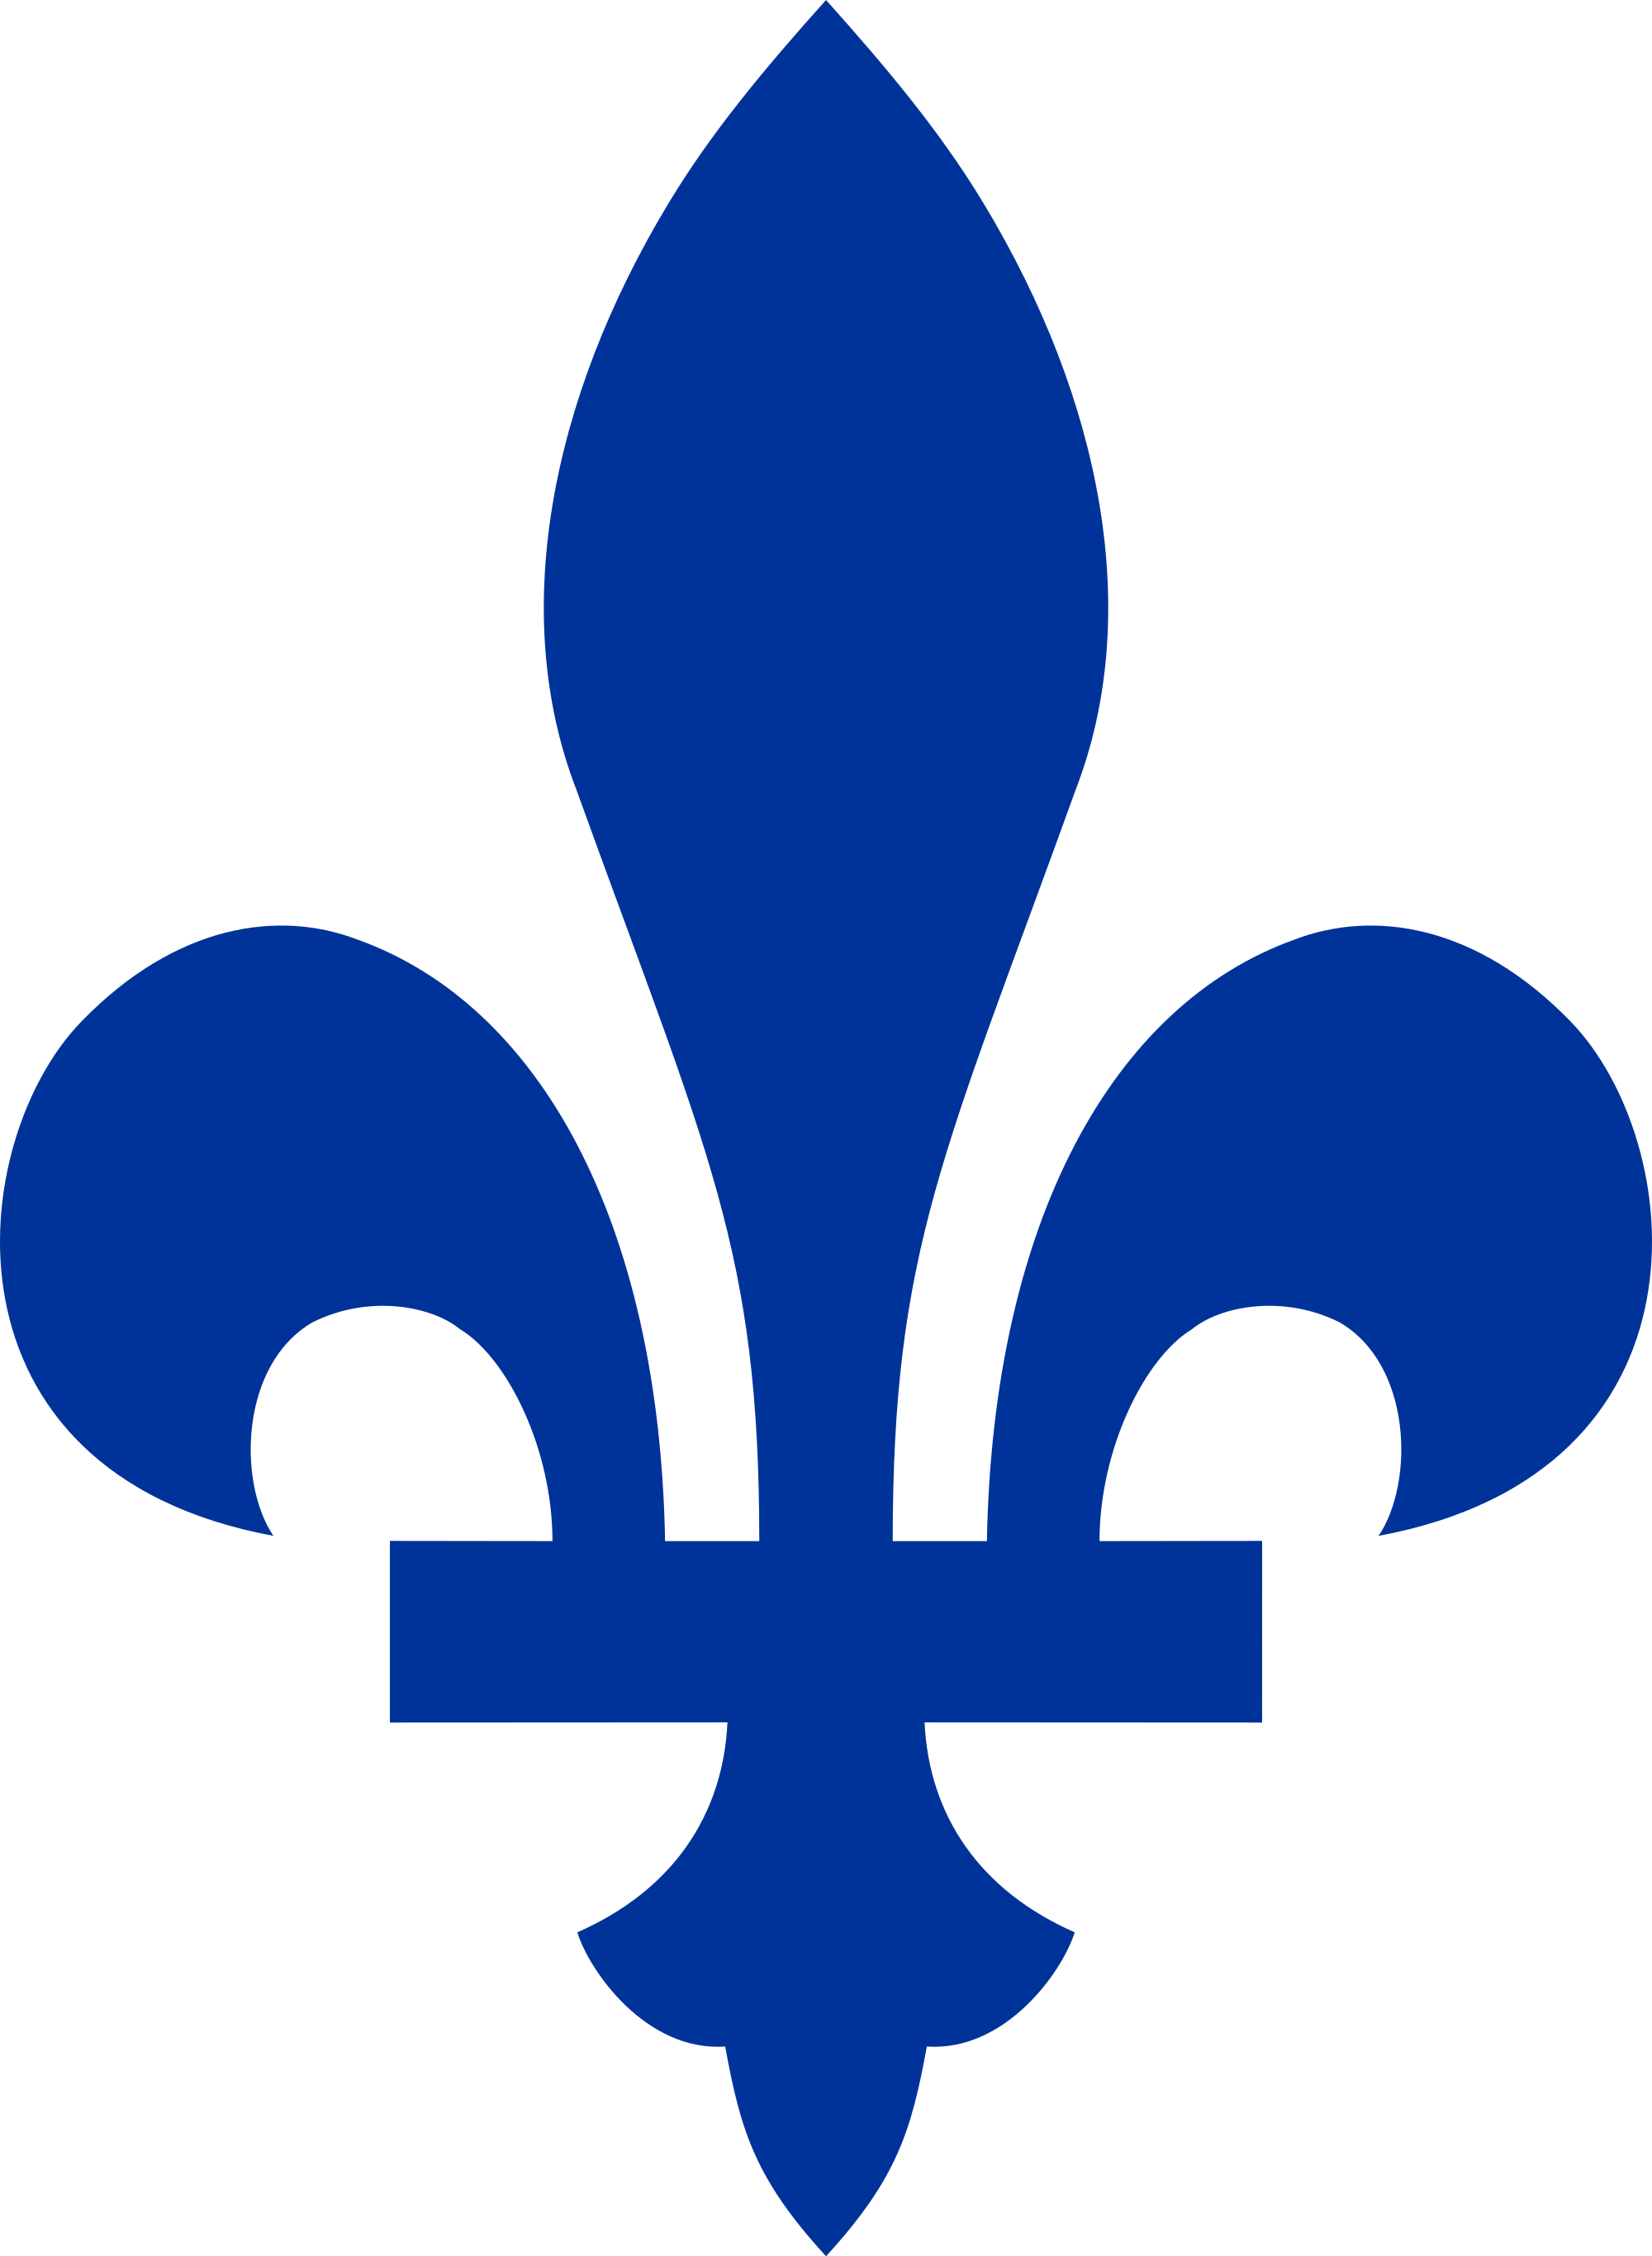 Quebec Fleur De Lis Transparent Png Stickpng